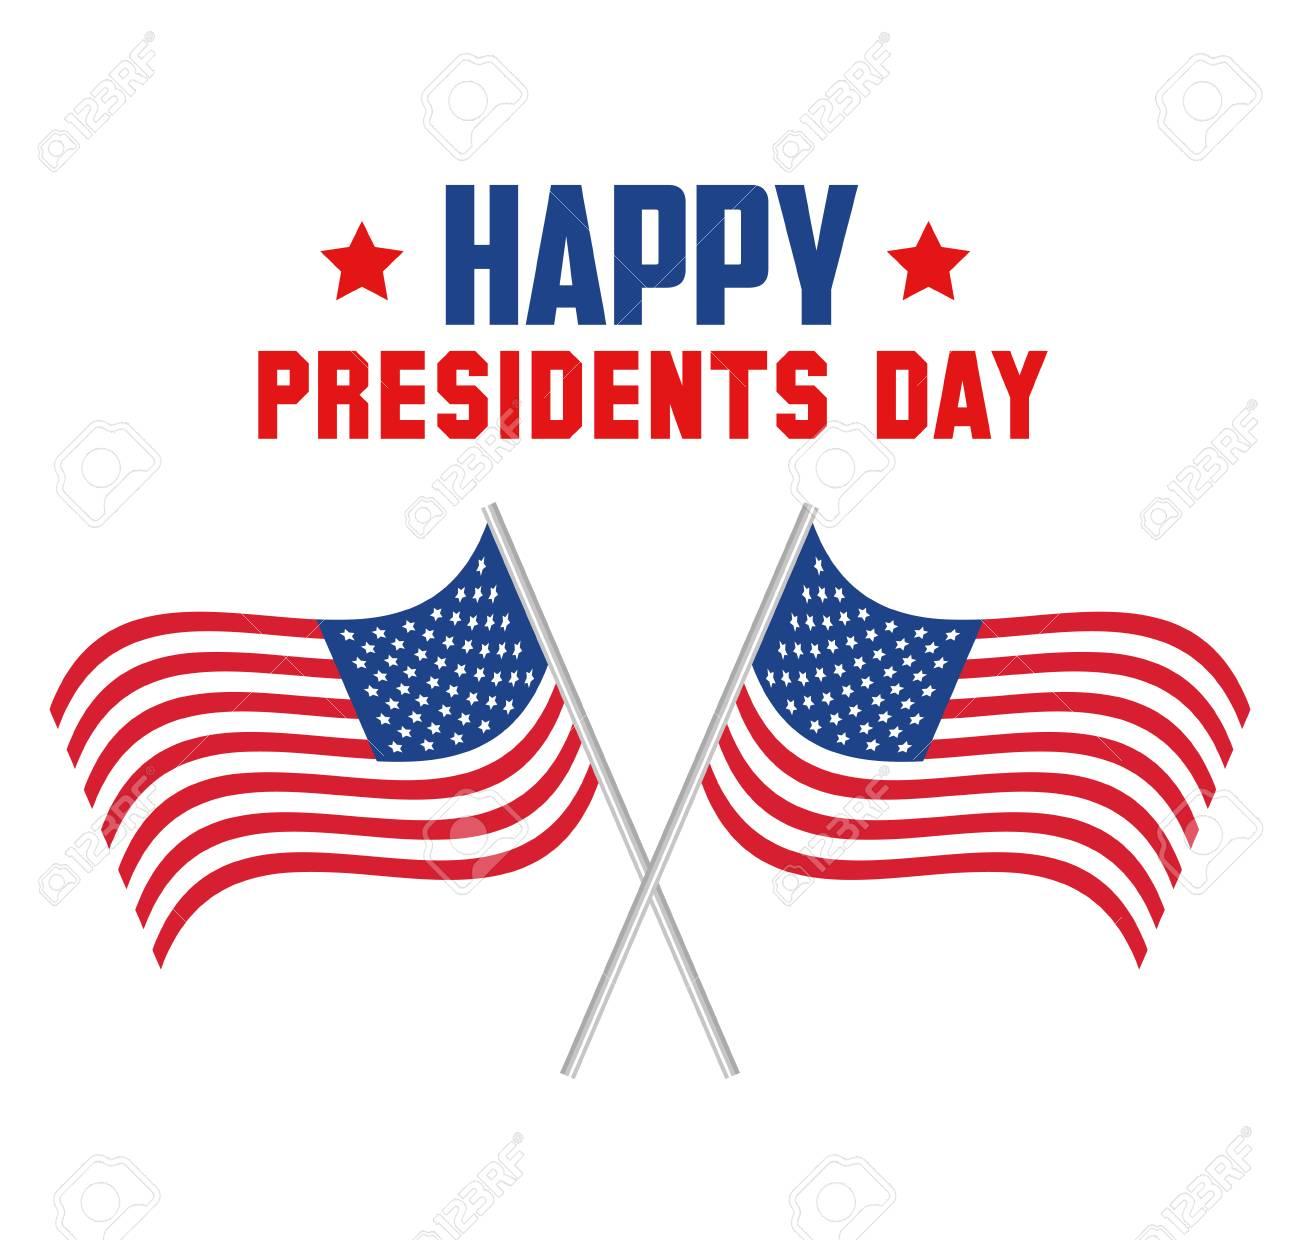 happy presidents day poster vector illustration design.